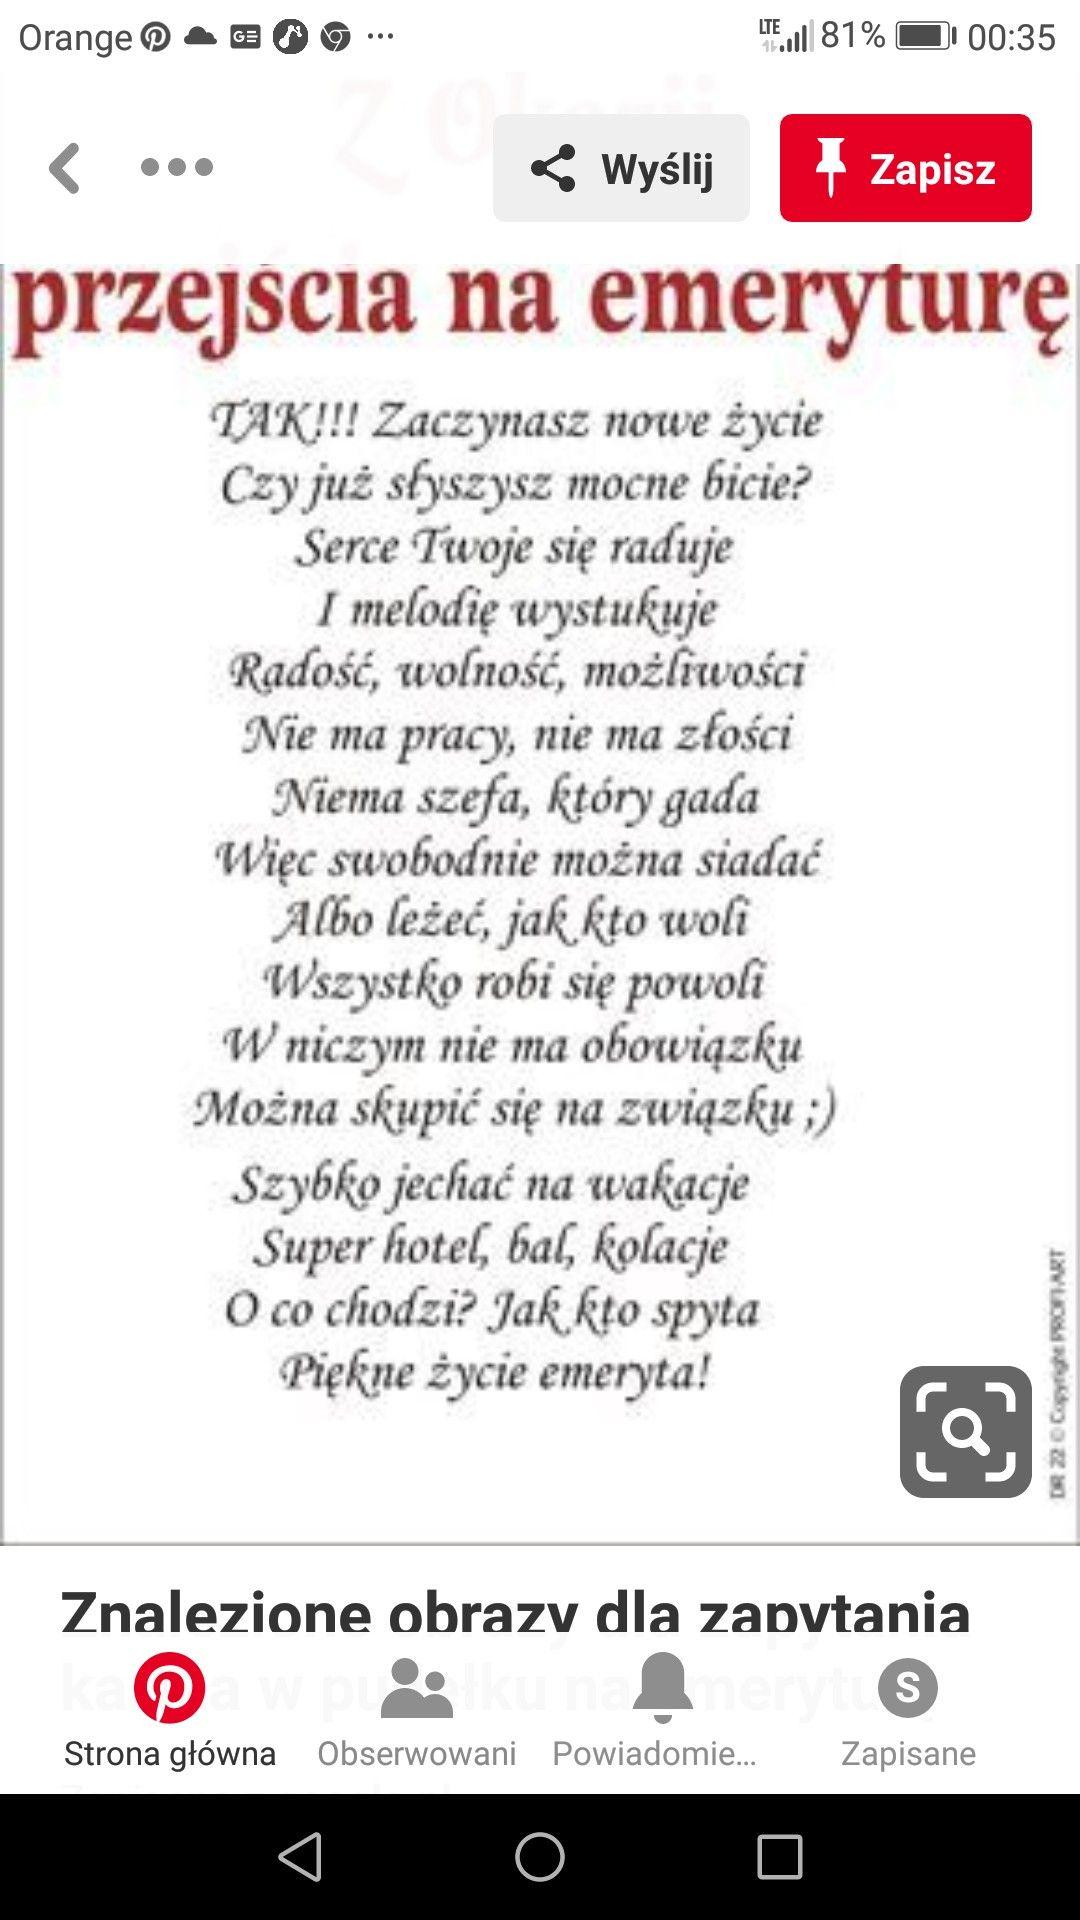 Pin By Malgorzata Moon On Kartki Weekend Humor Humor Quotes